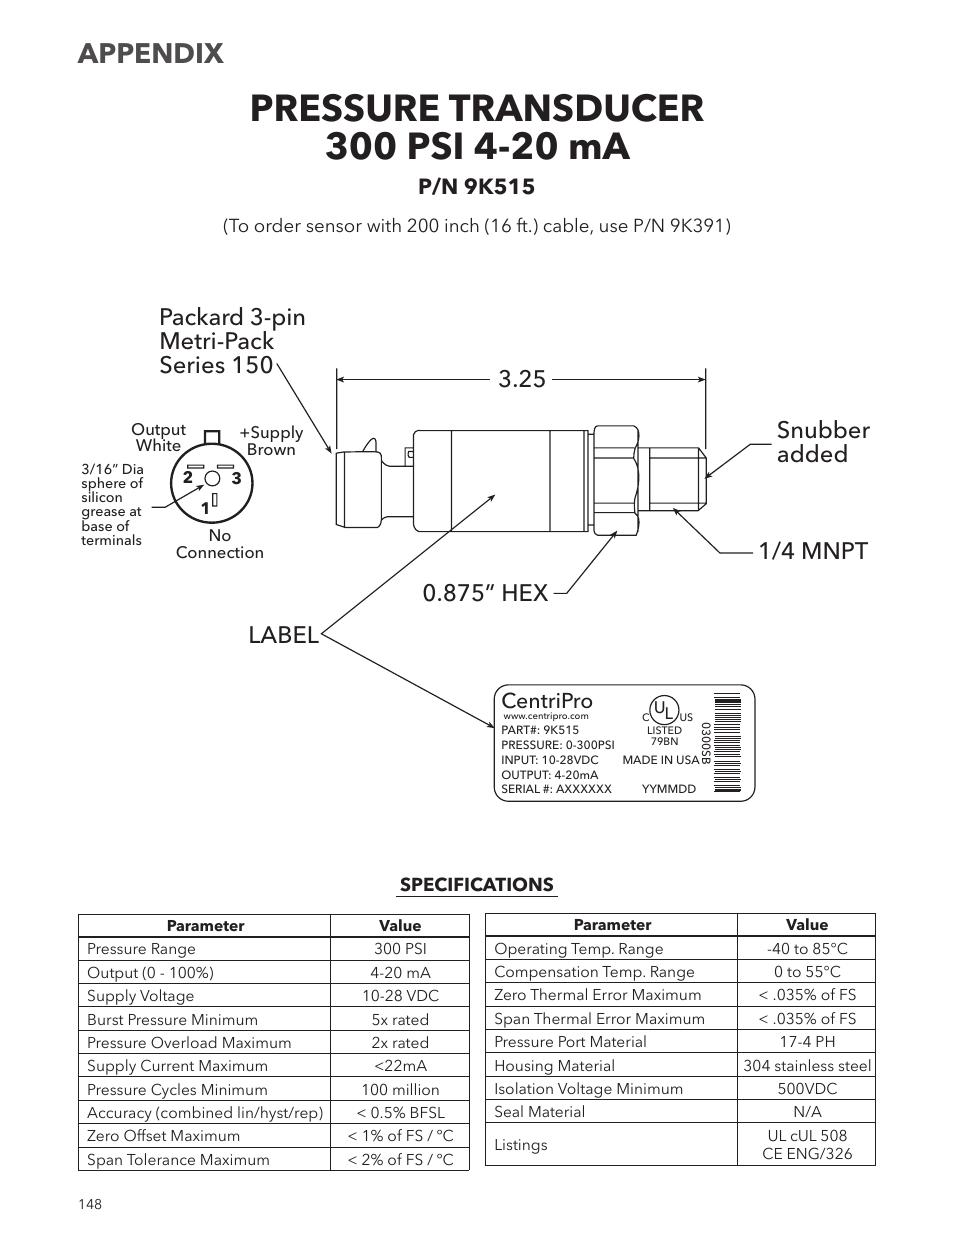 hight resolution of appendix centripro p n 9k515 xylem im167 r8 aquavar cpc centrifugal pump control user manual page 148 152